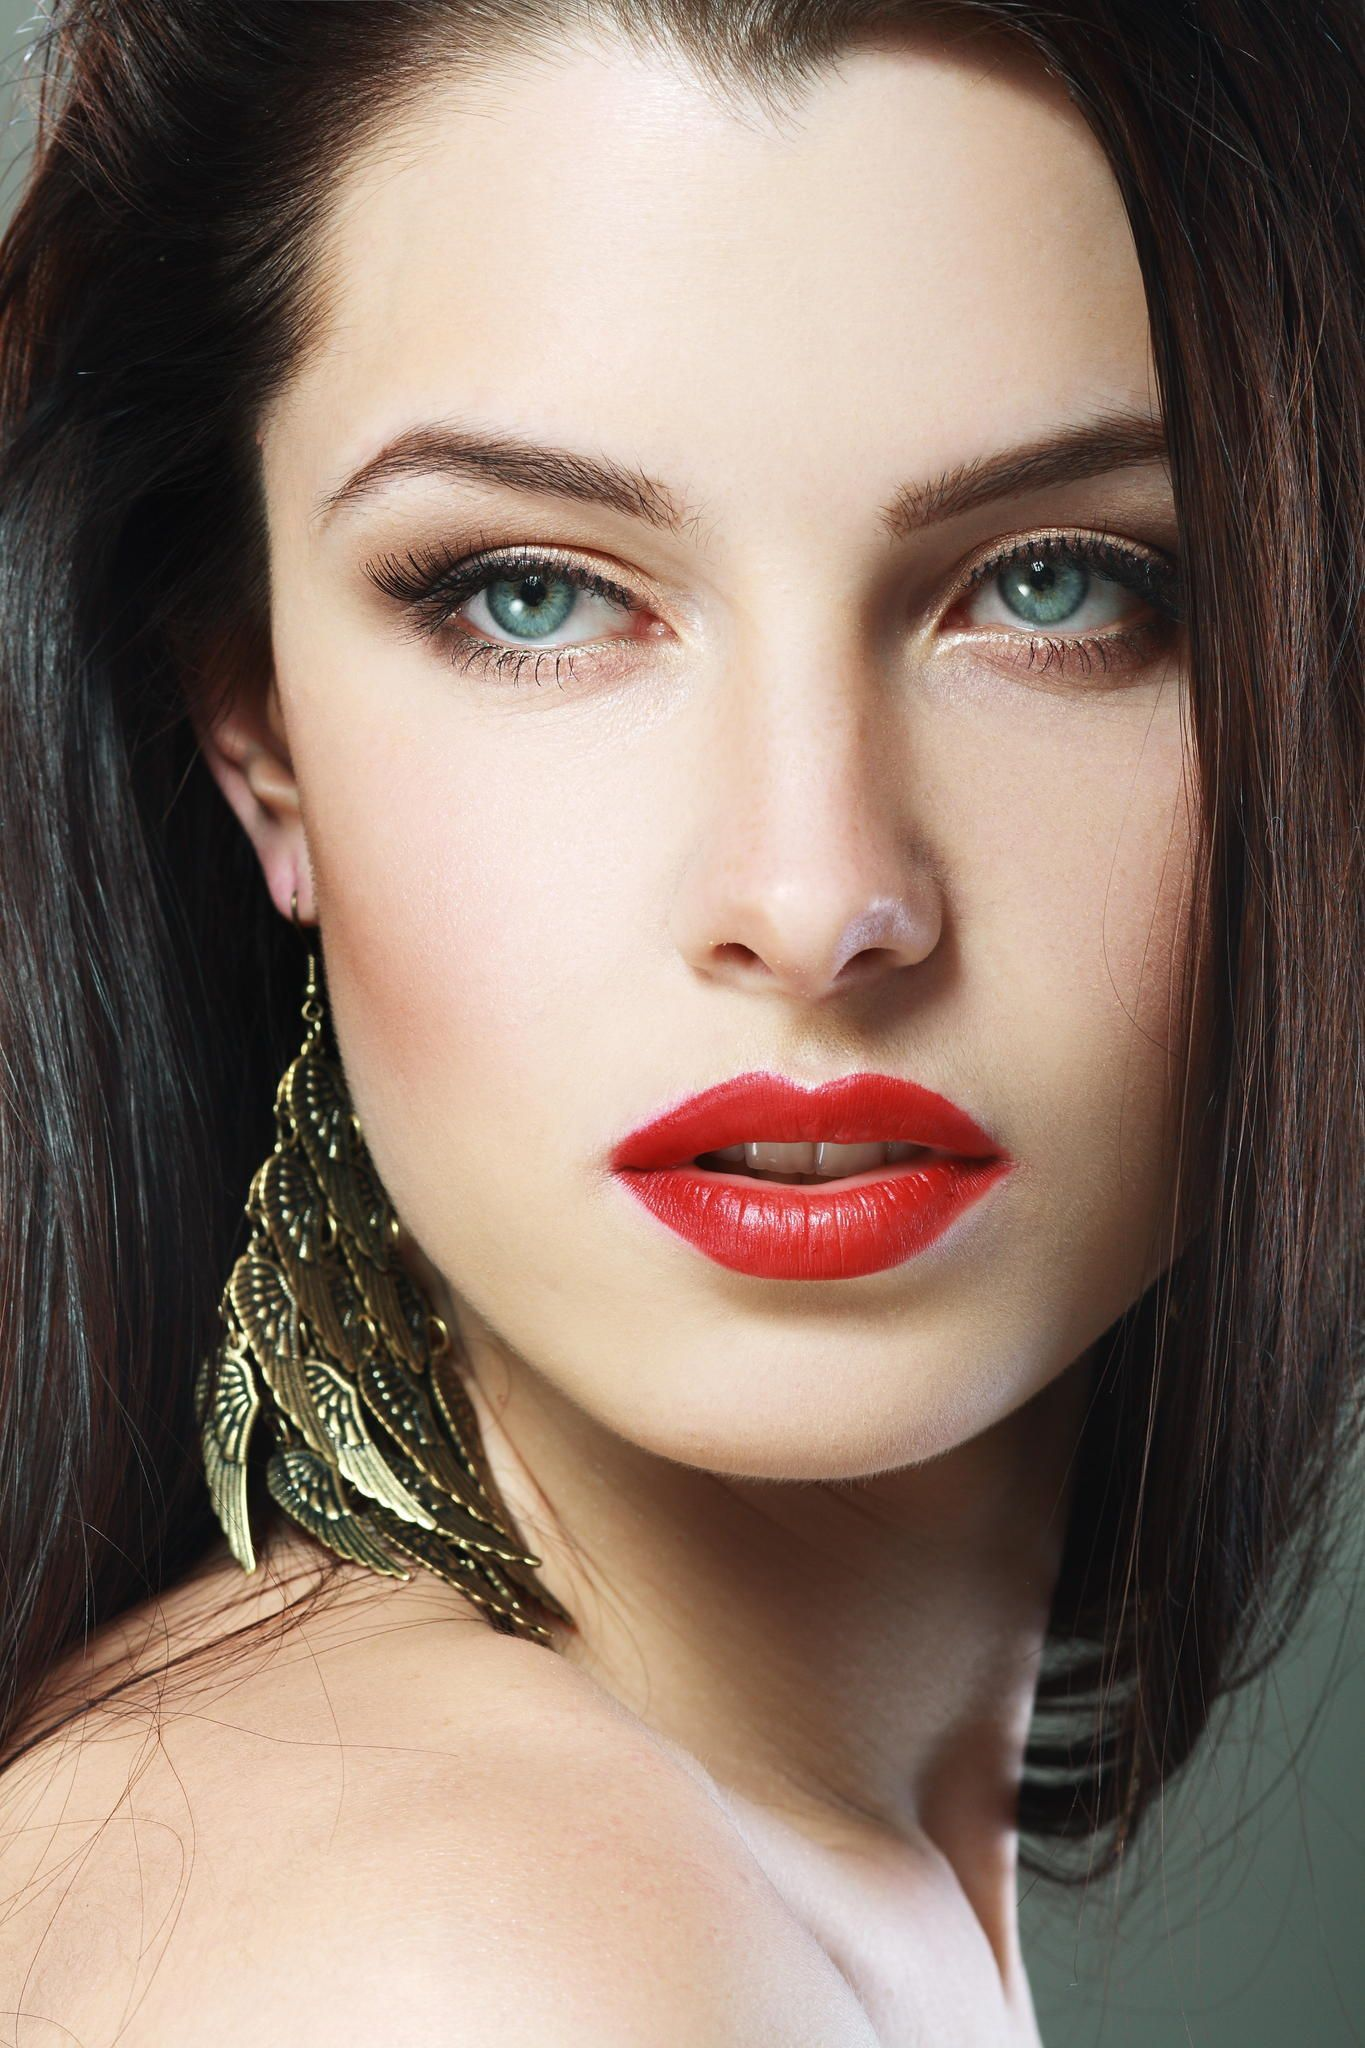 MakeUp Trends Fall/Winter 20102011 Red lipstick makeup